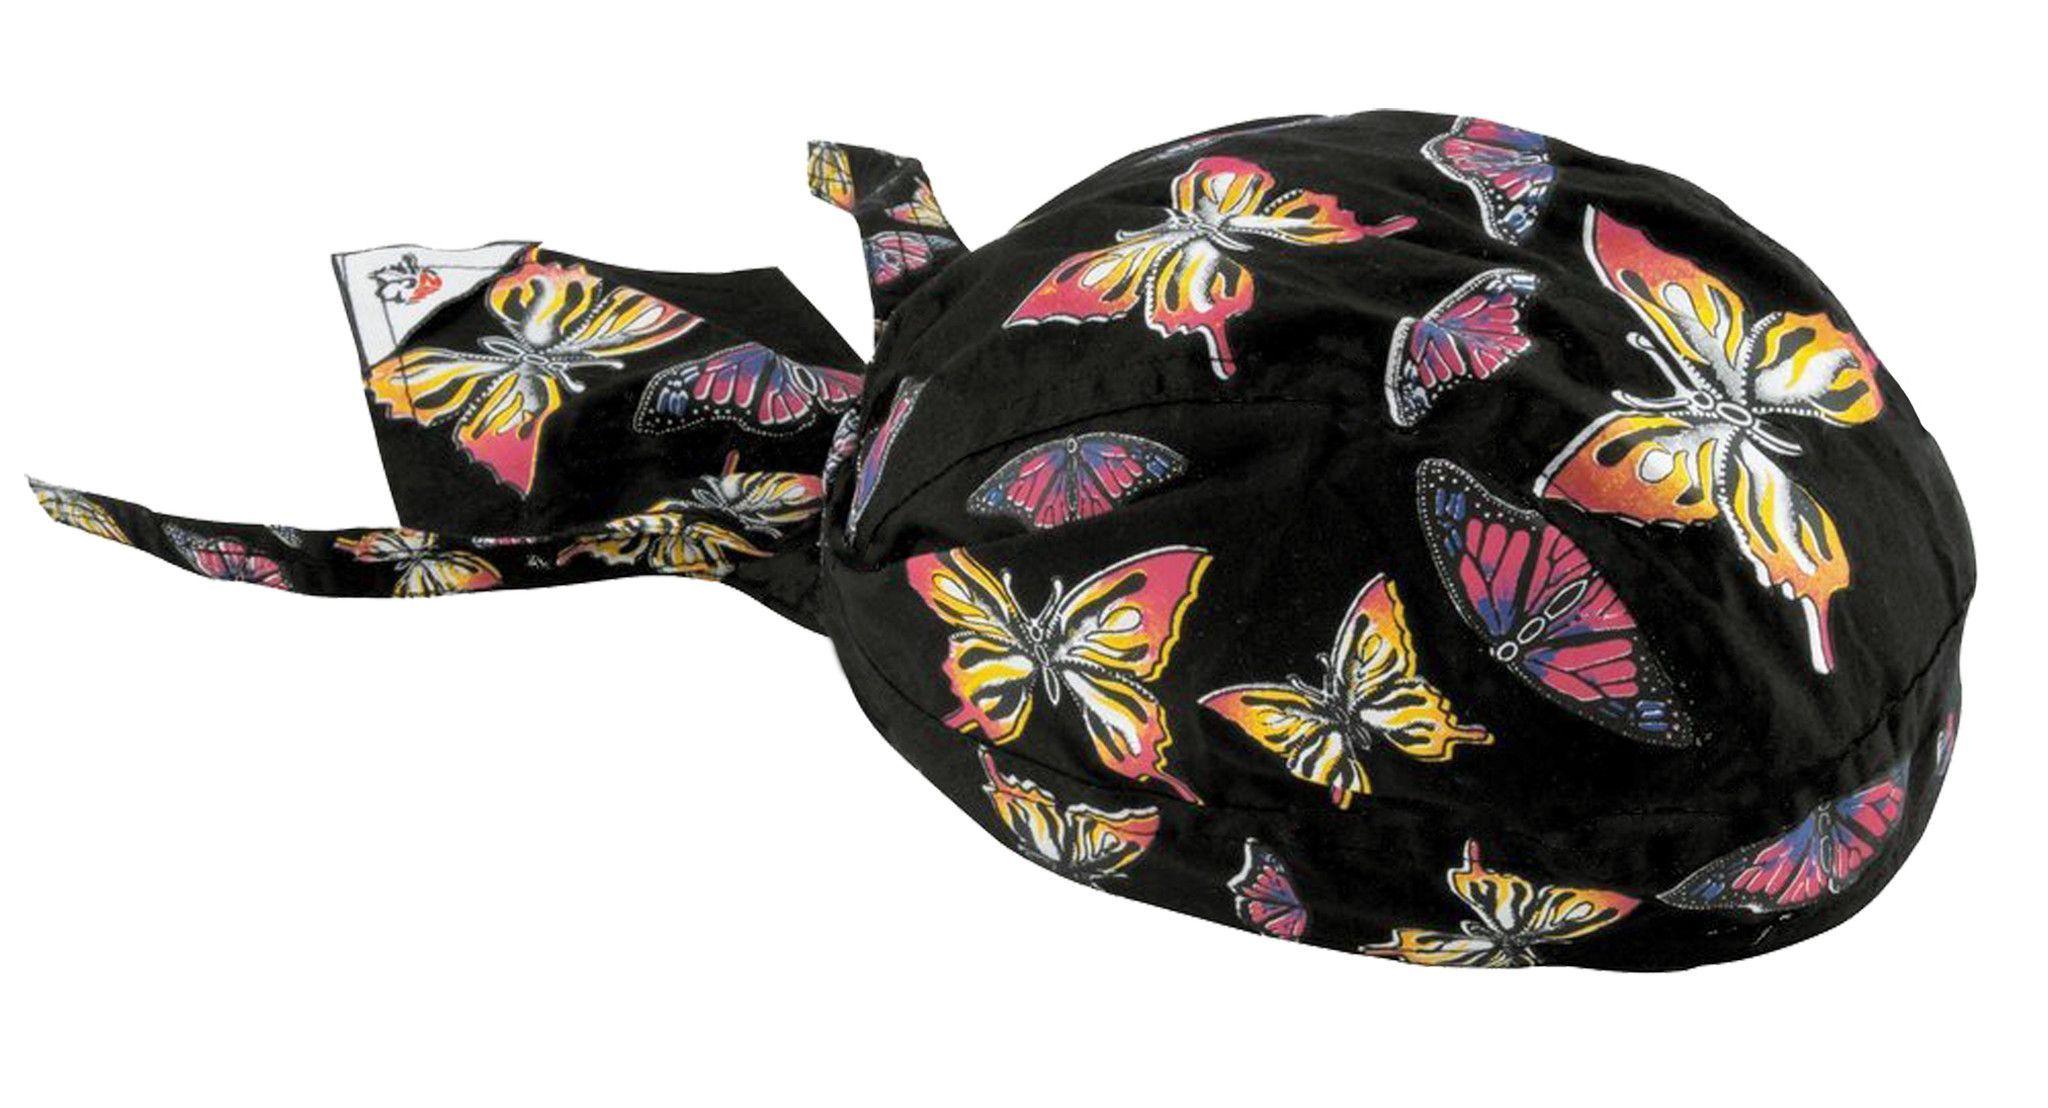 Colorful Rainbow Butterfly Head Wrap Womens Doo Rag Durag Skull Cap Cotton  Sporty Motorcycle Hat 96b3bdf9a6e9